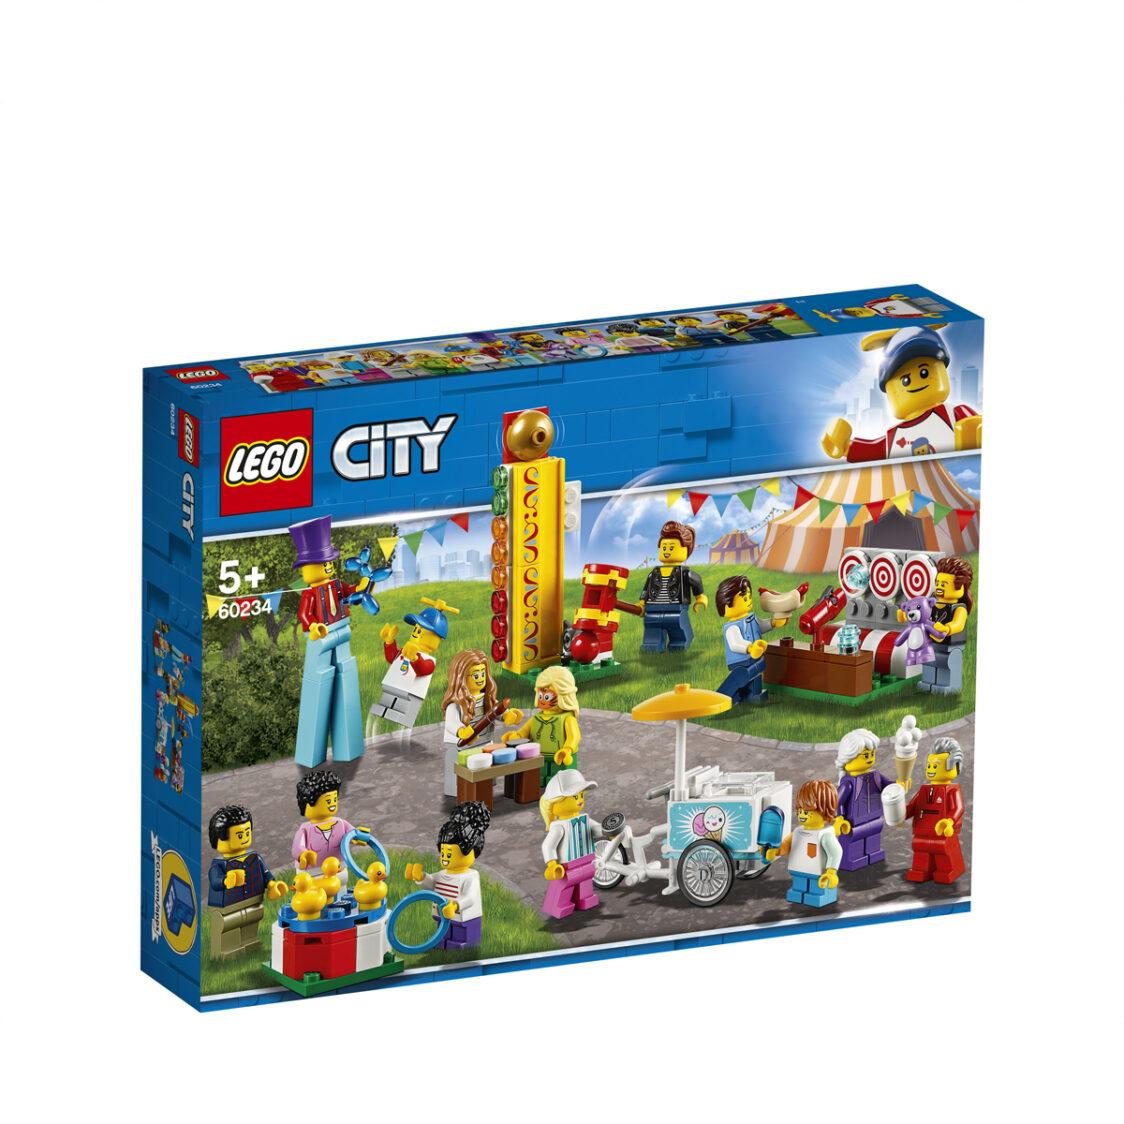 LEGO People Pack Fun Fair 60234 V29